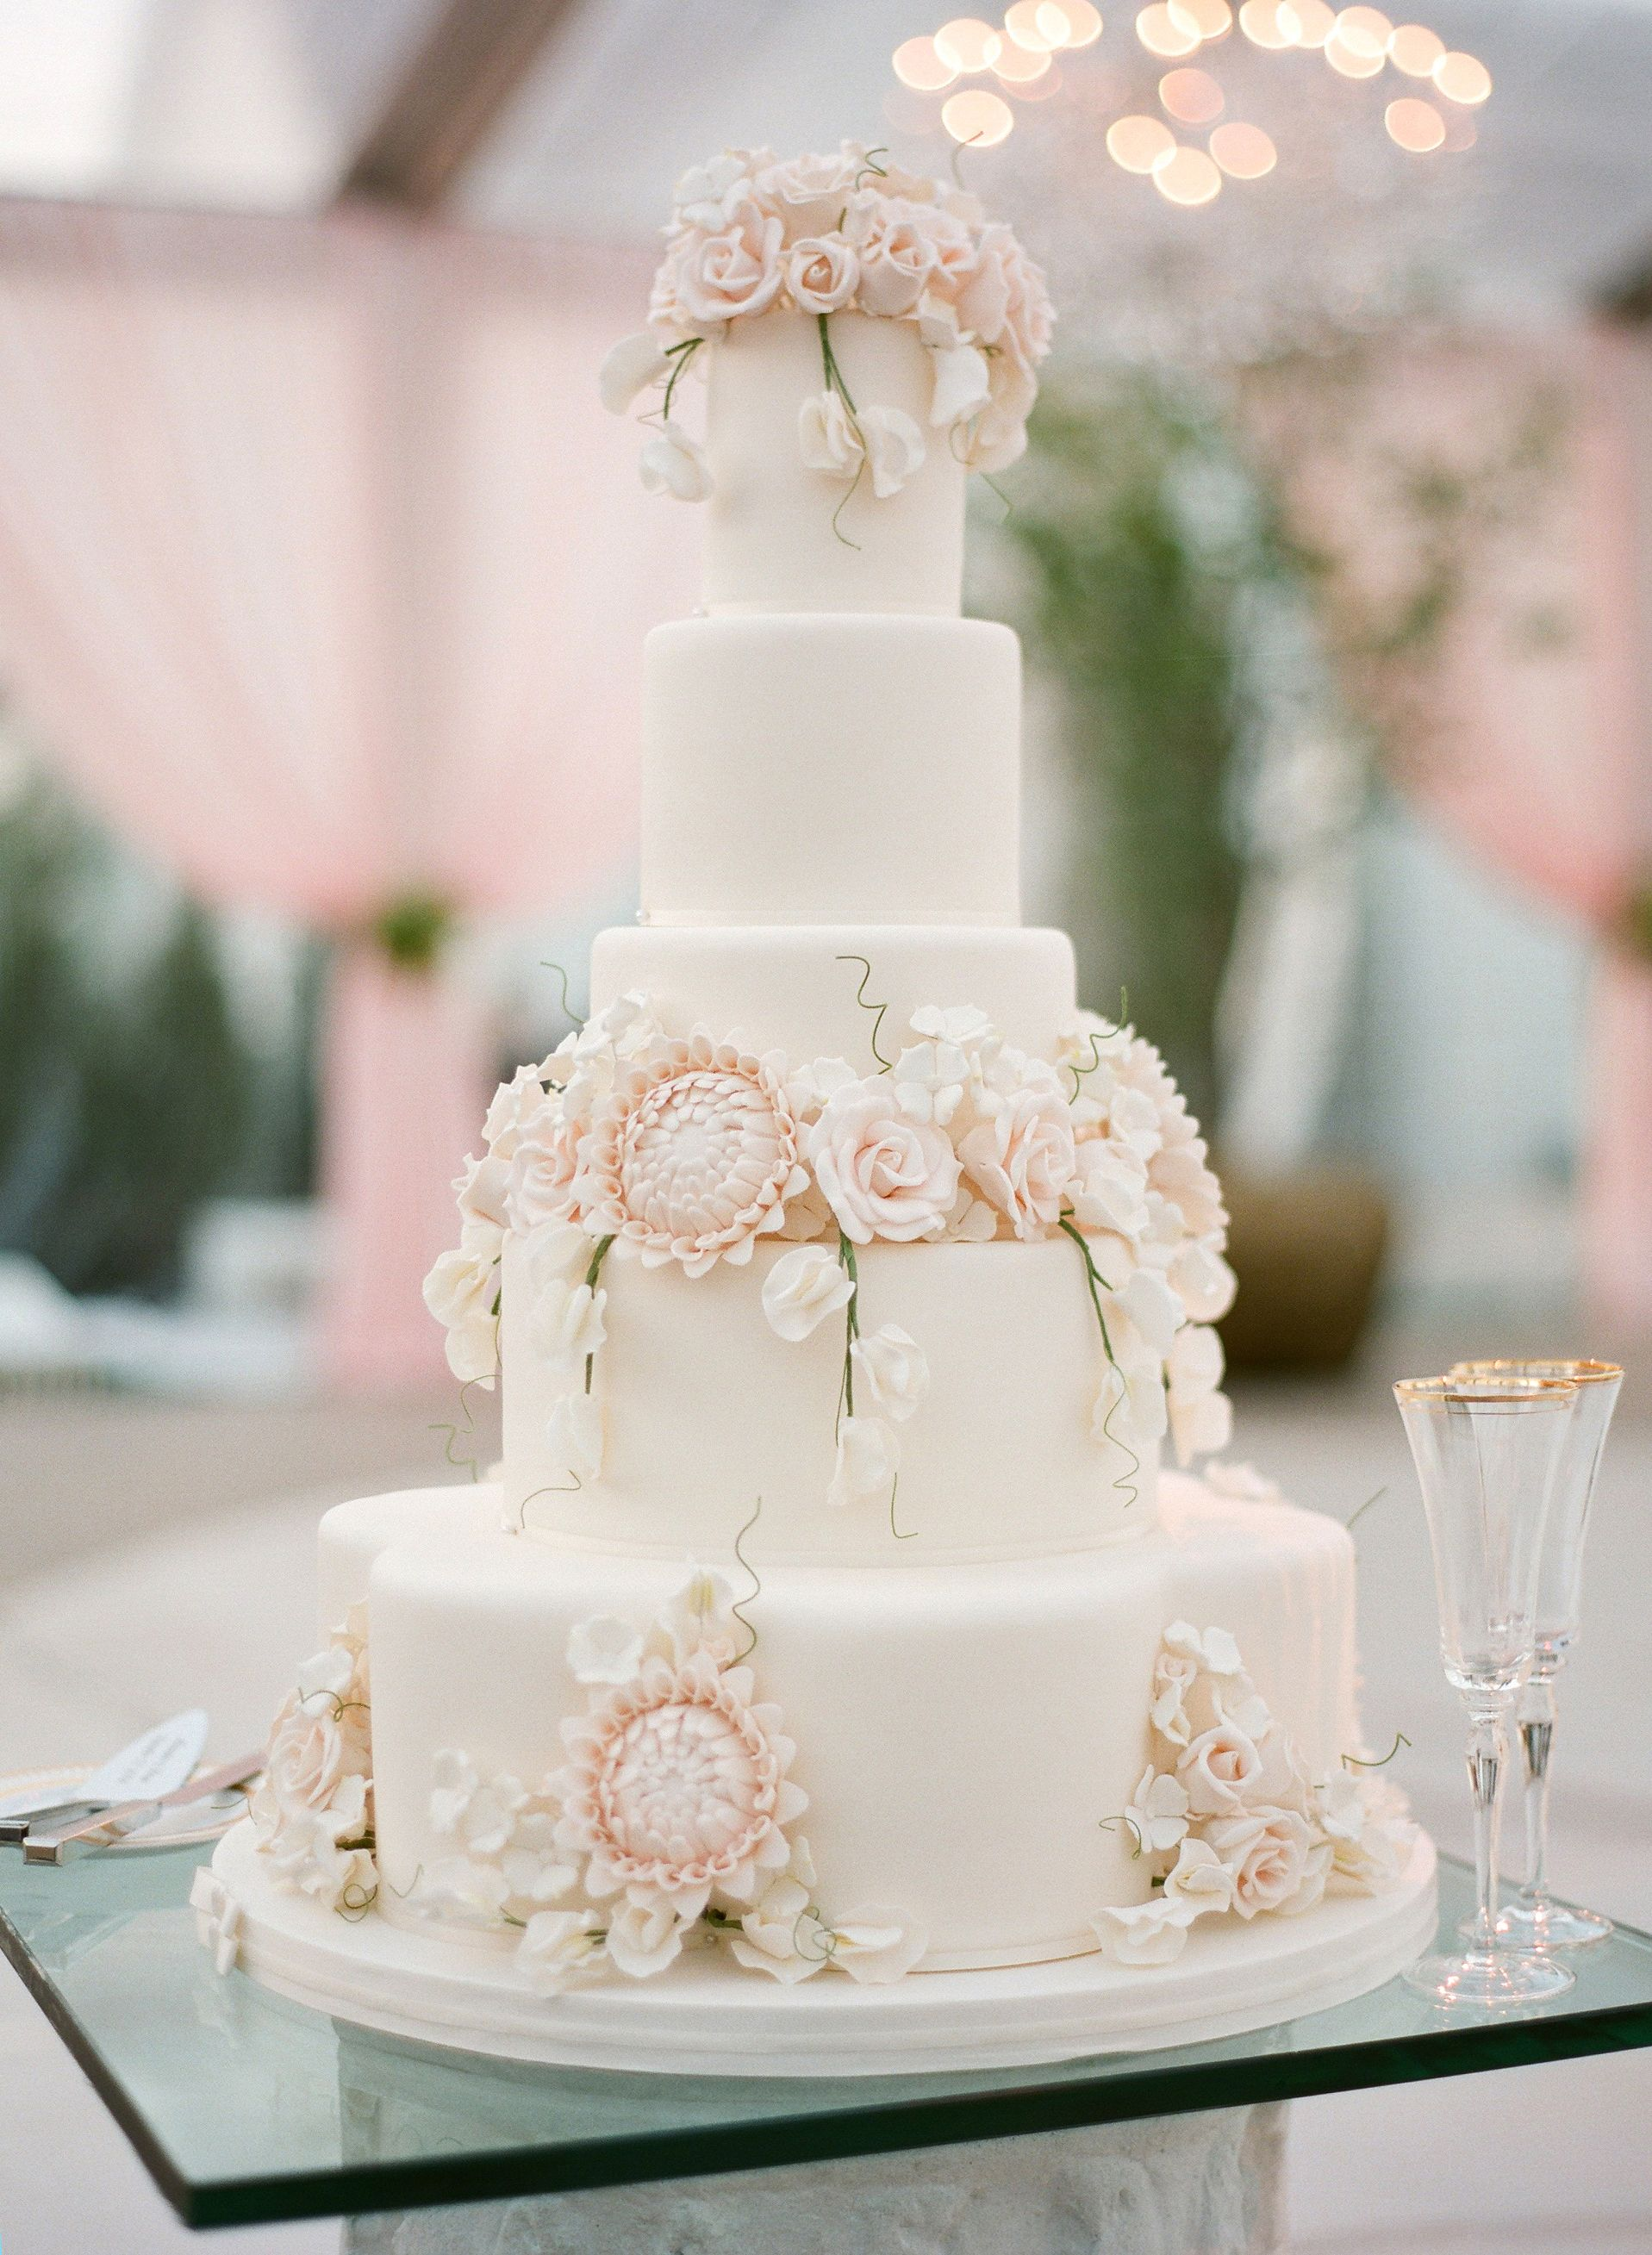 Amy Beck Cake Design Chicago, IL 5 tier wedding cake